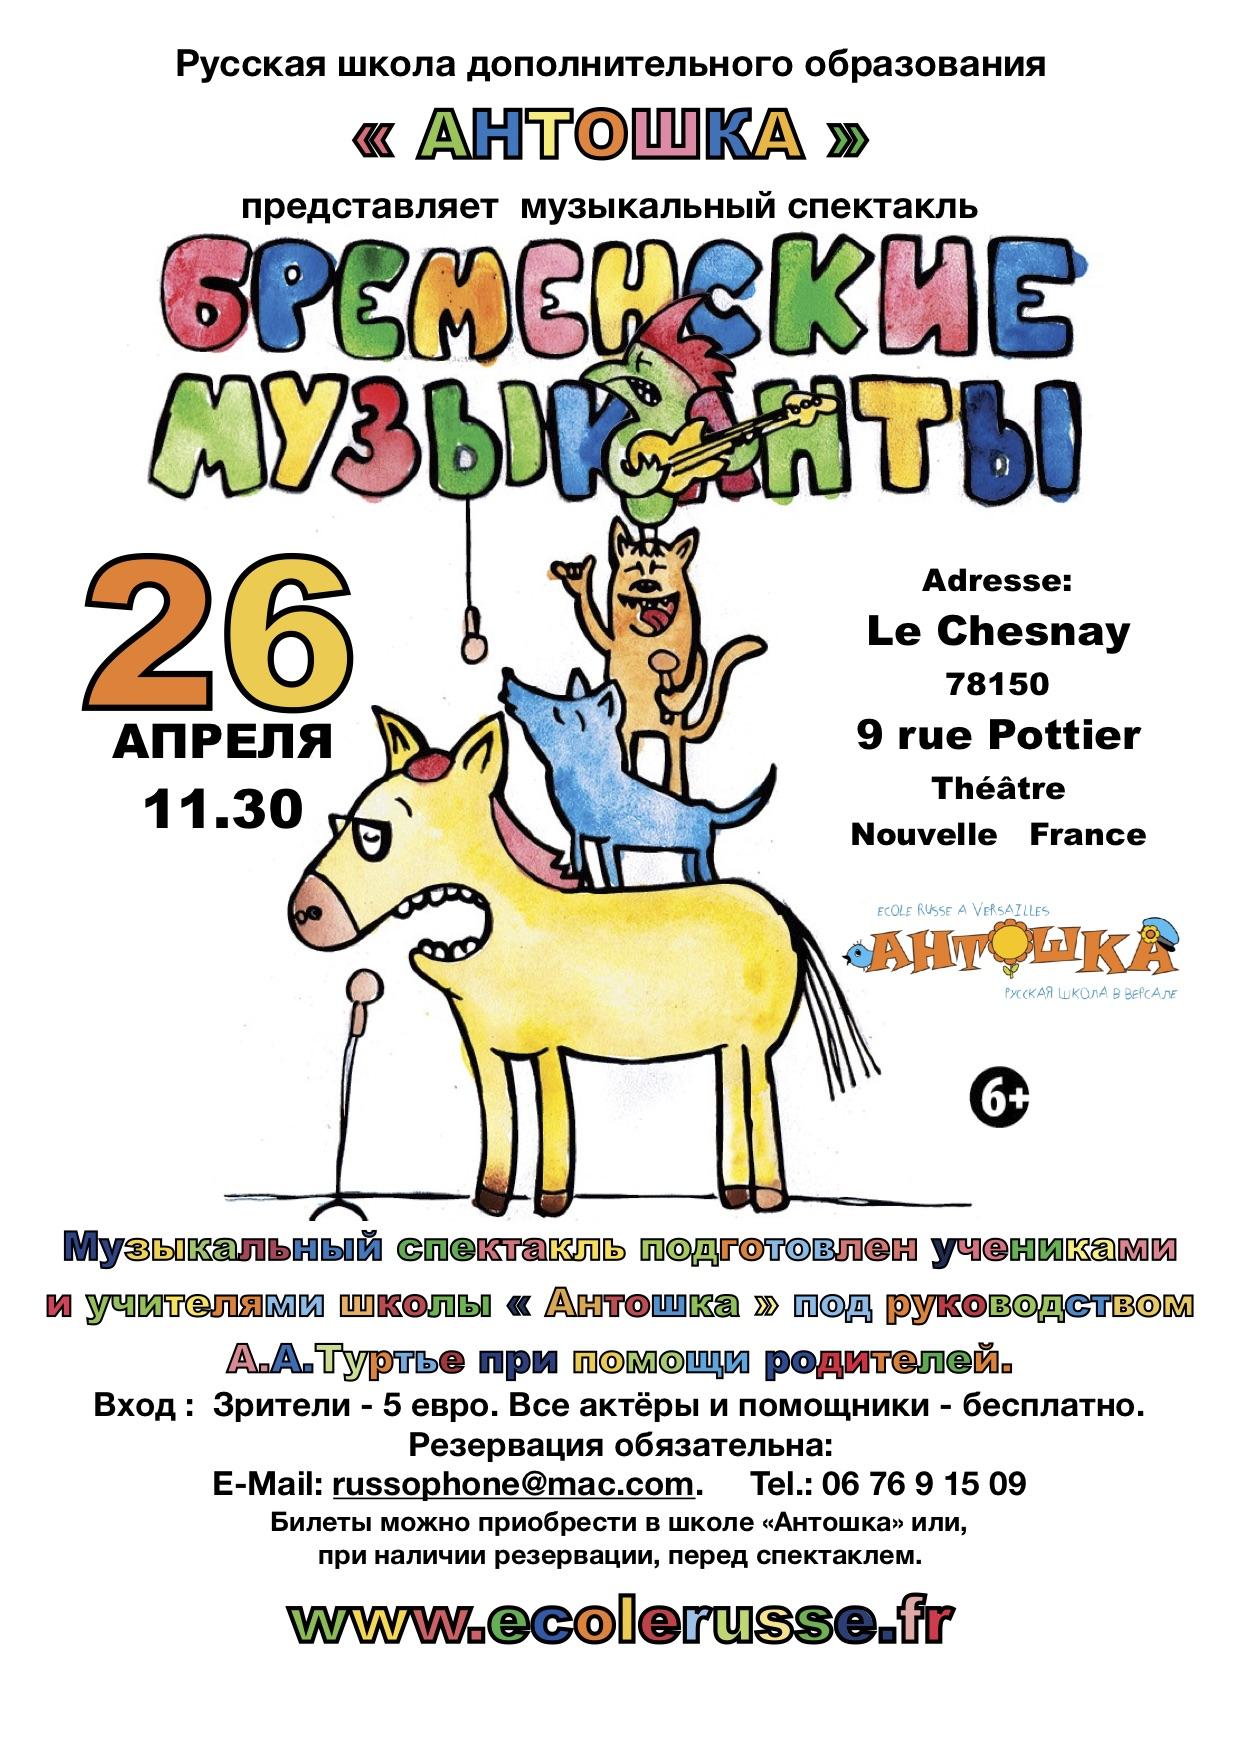 26 апреля спектакль БРЕМЕНСКИЕ МУЗЫКАНТЫ